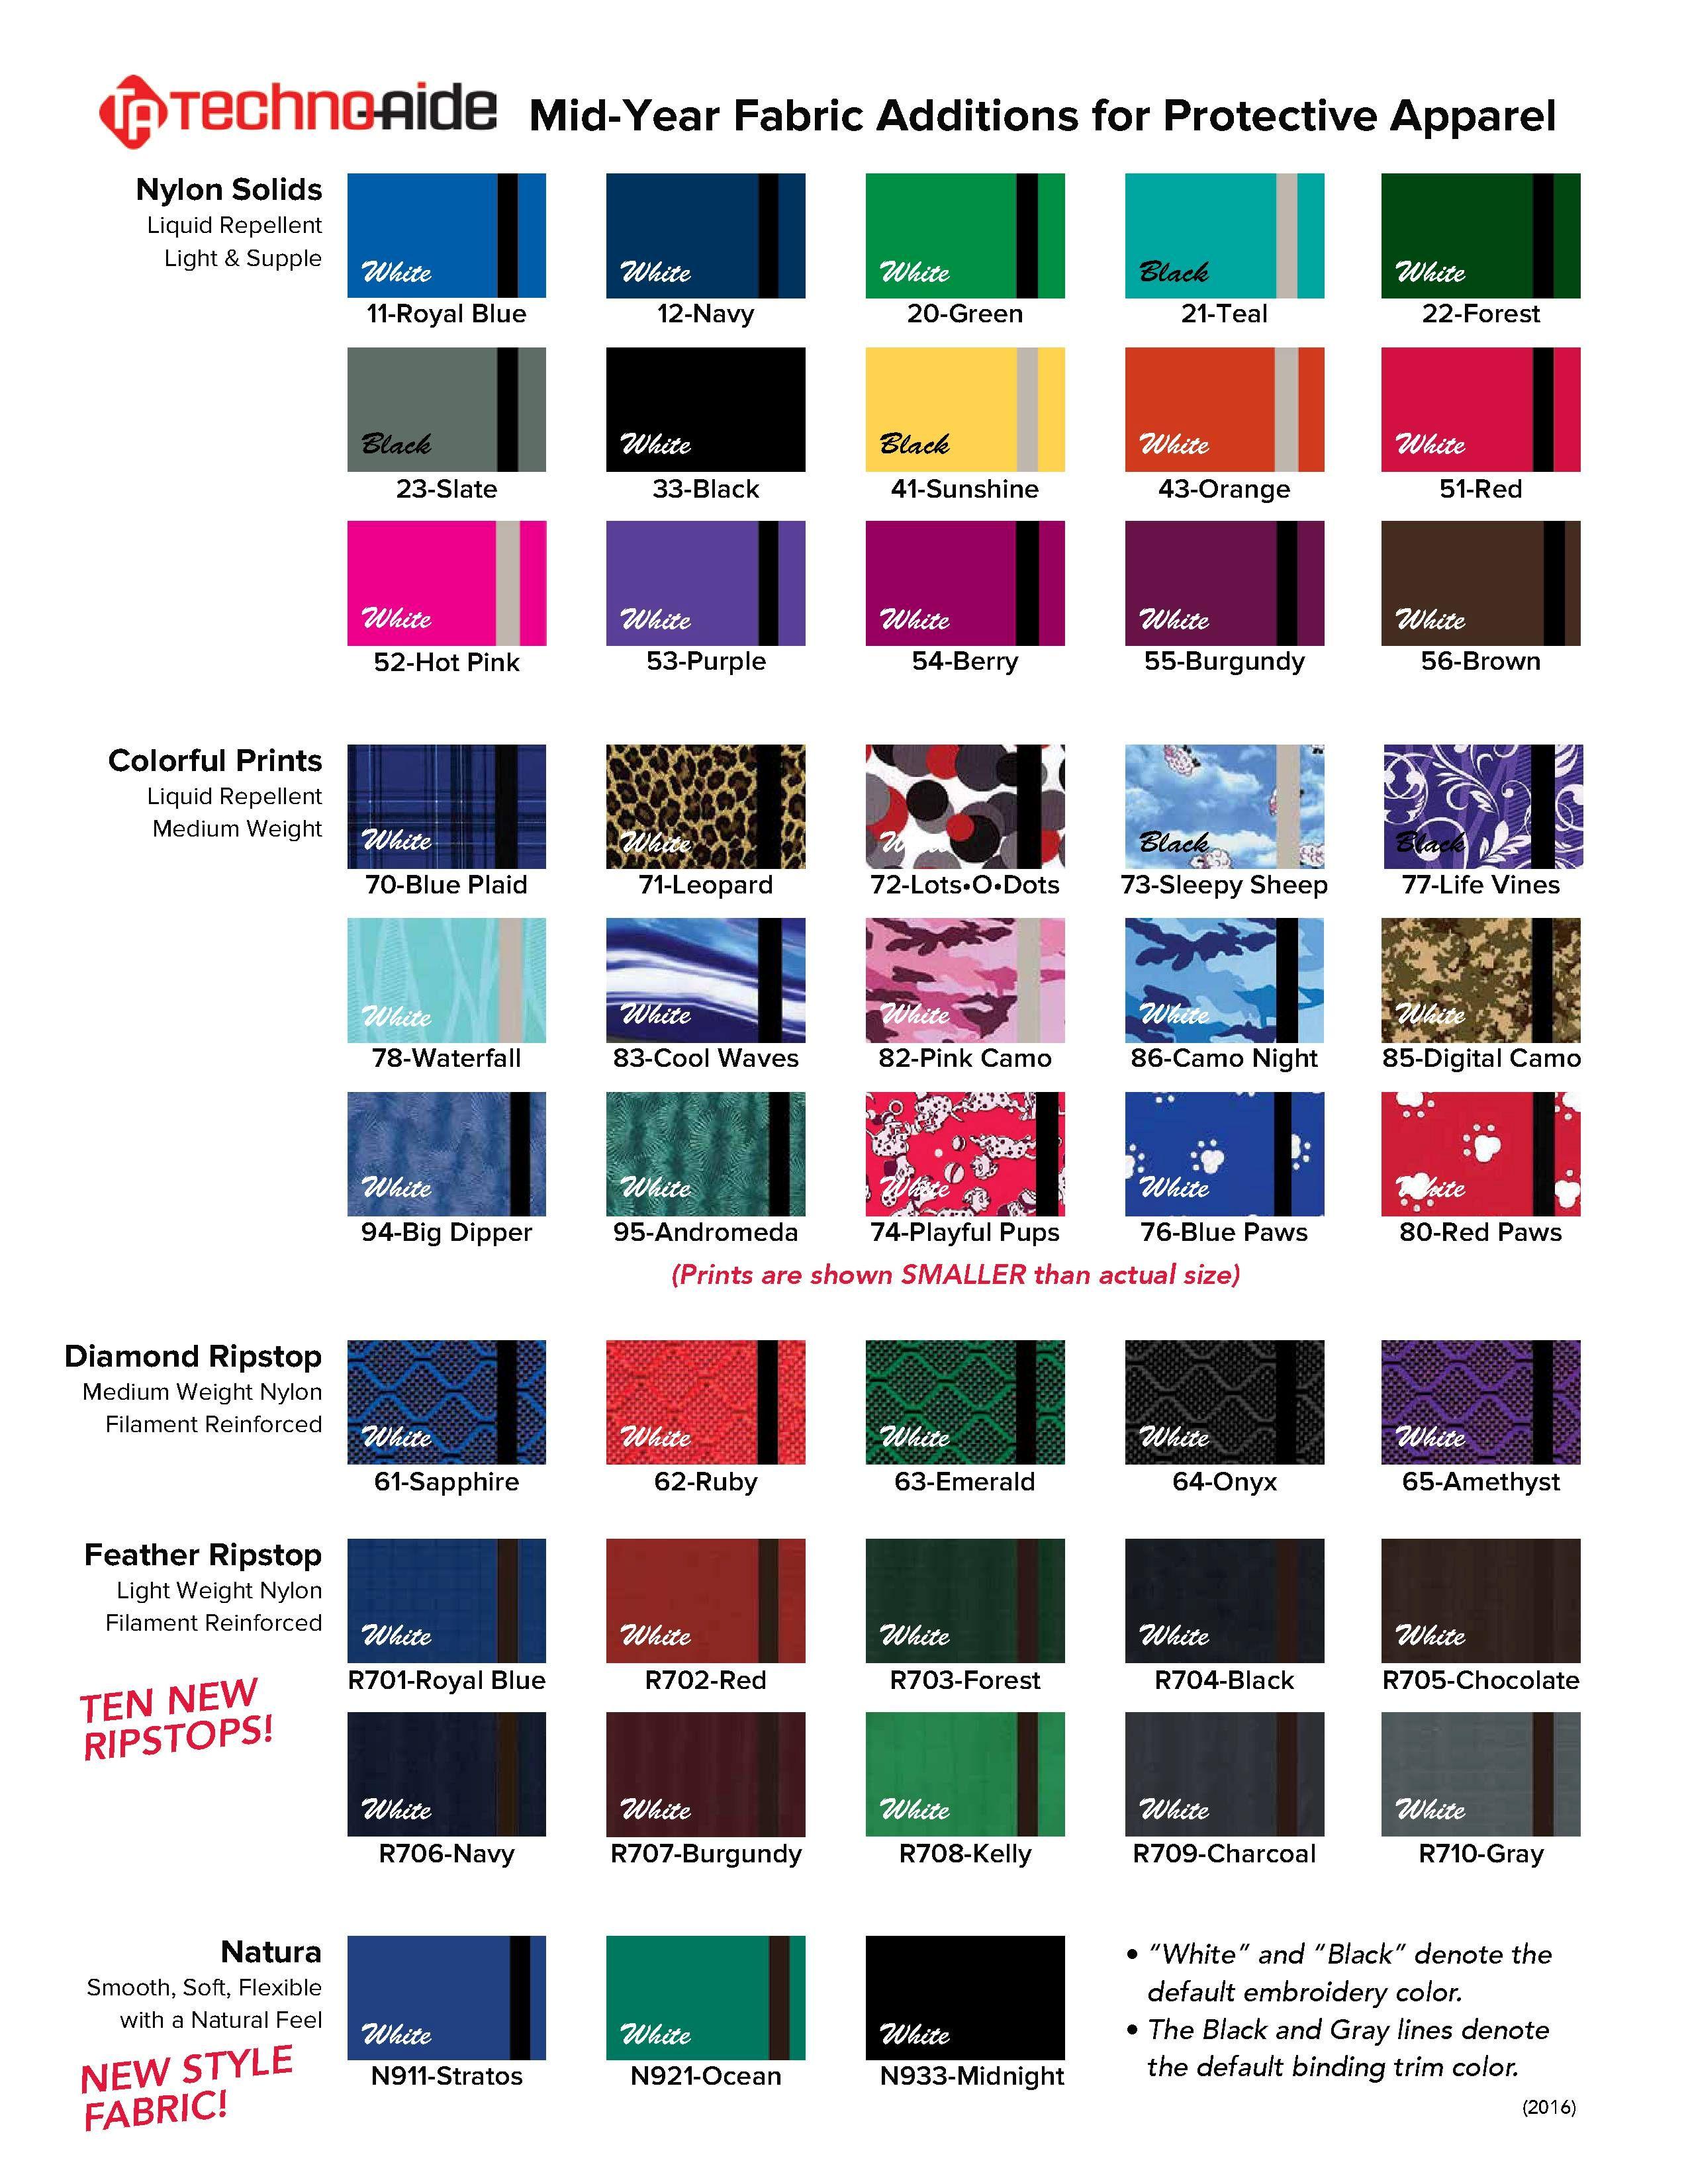 Techno Aide Apparel & Fabrics